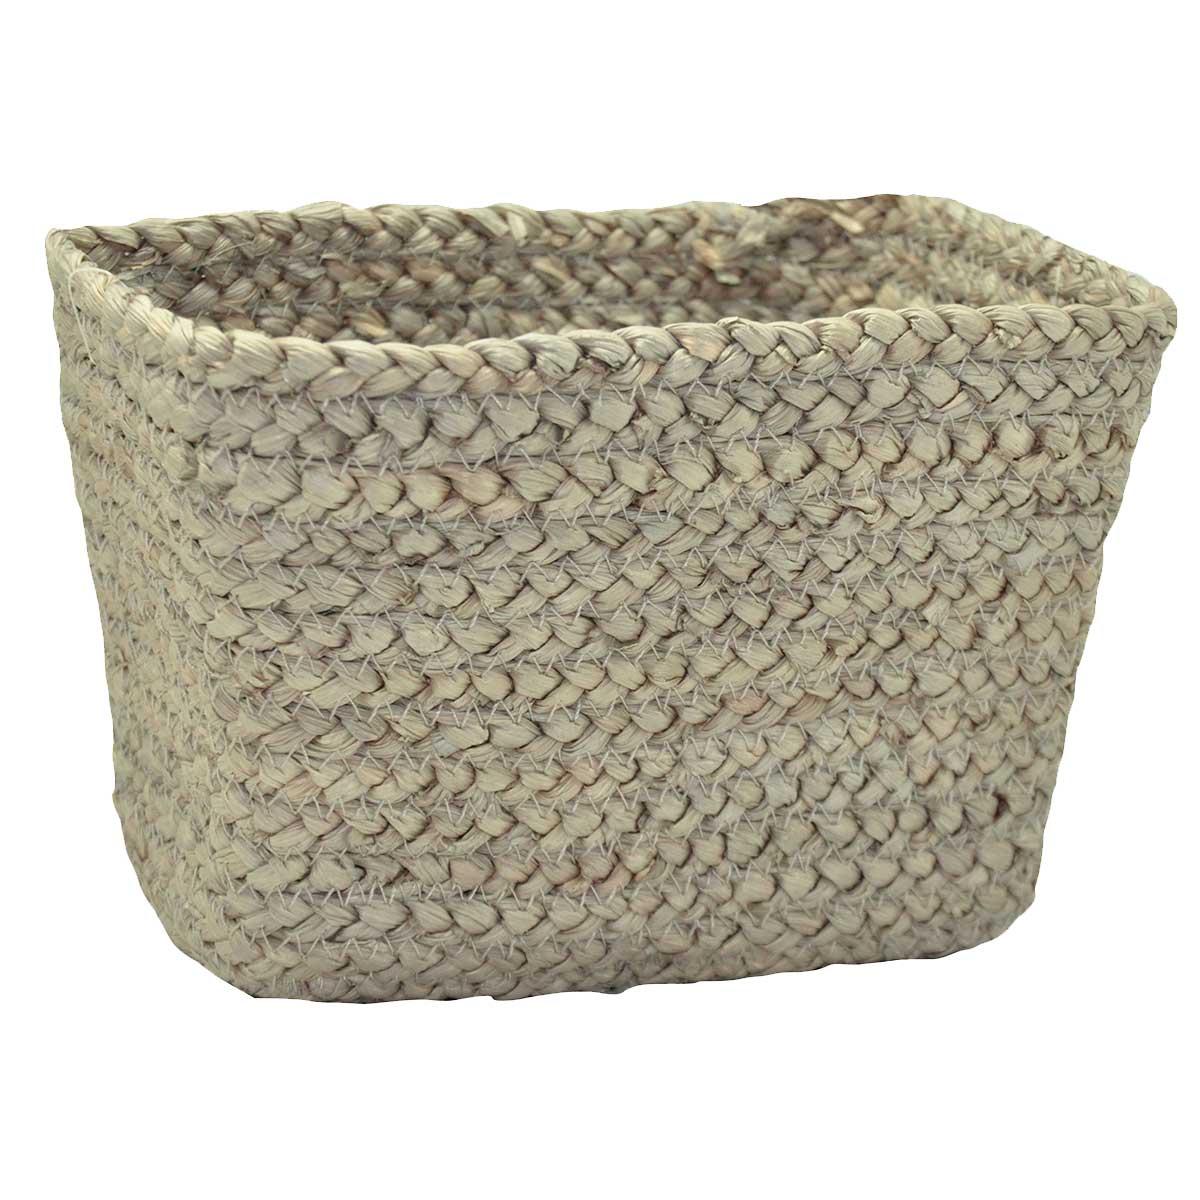 Panier rectangulaire en fibre de mais taupe